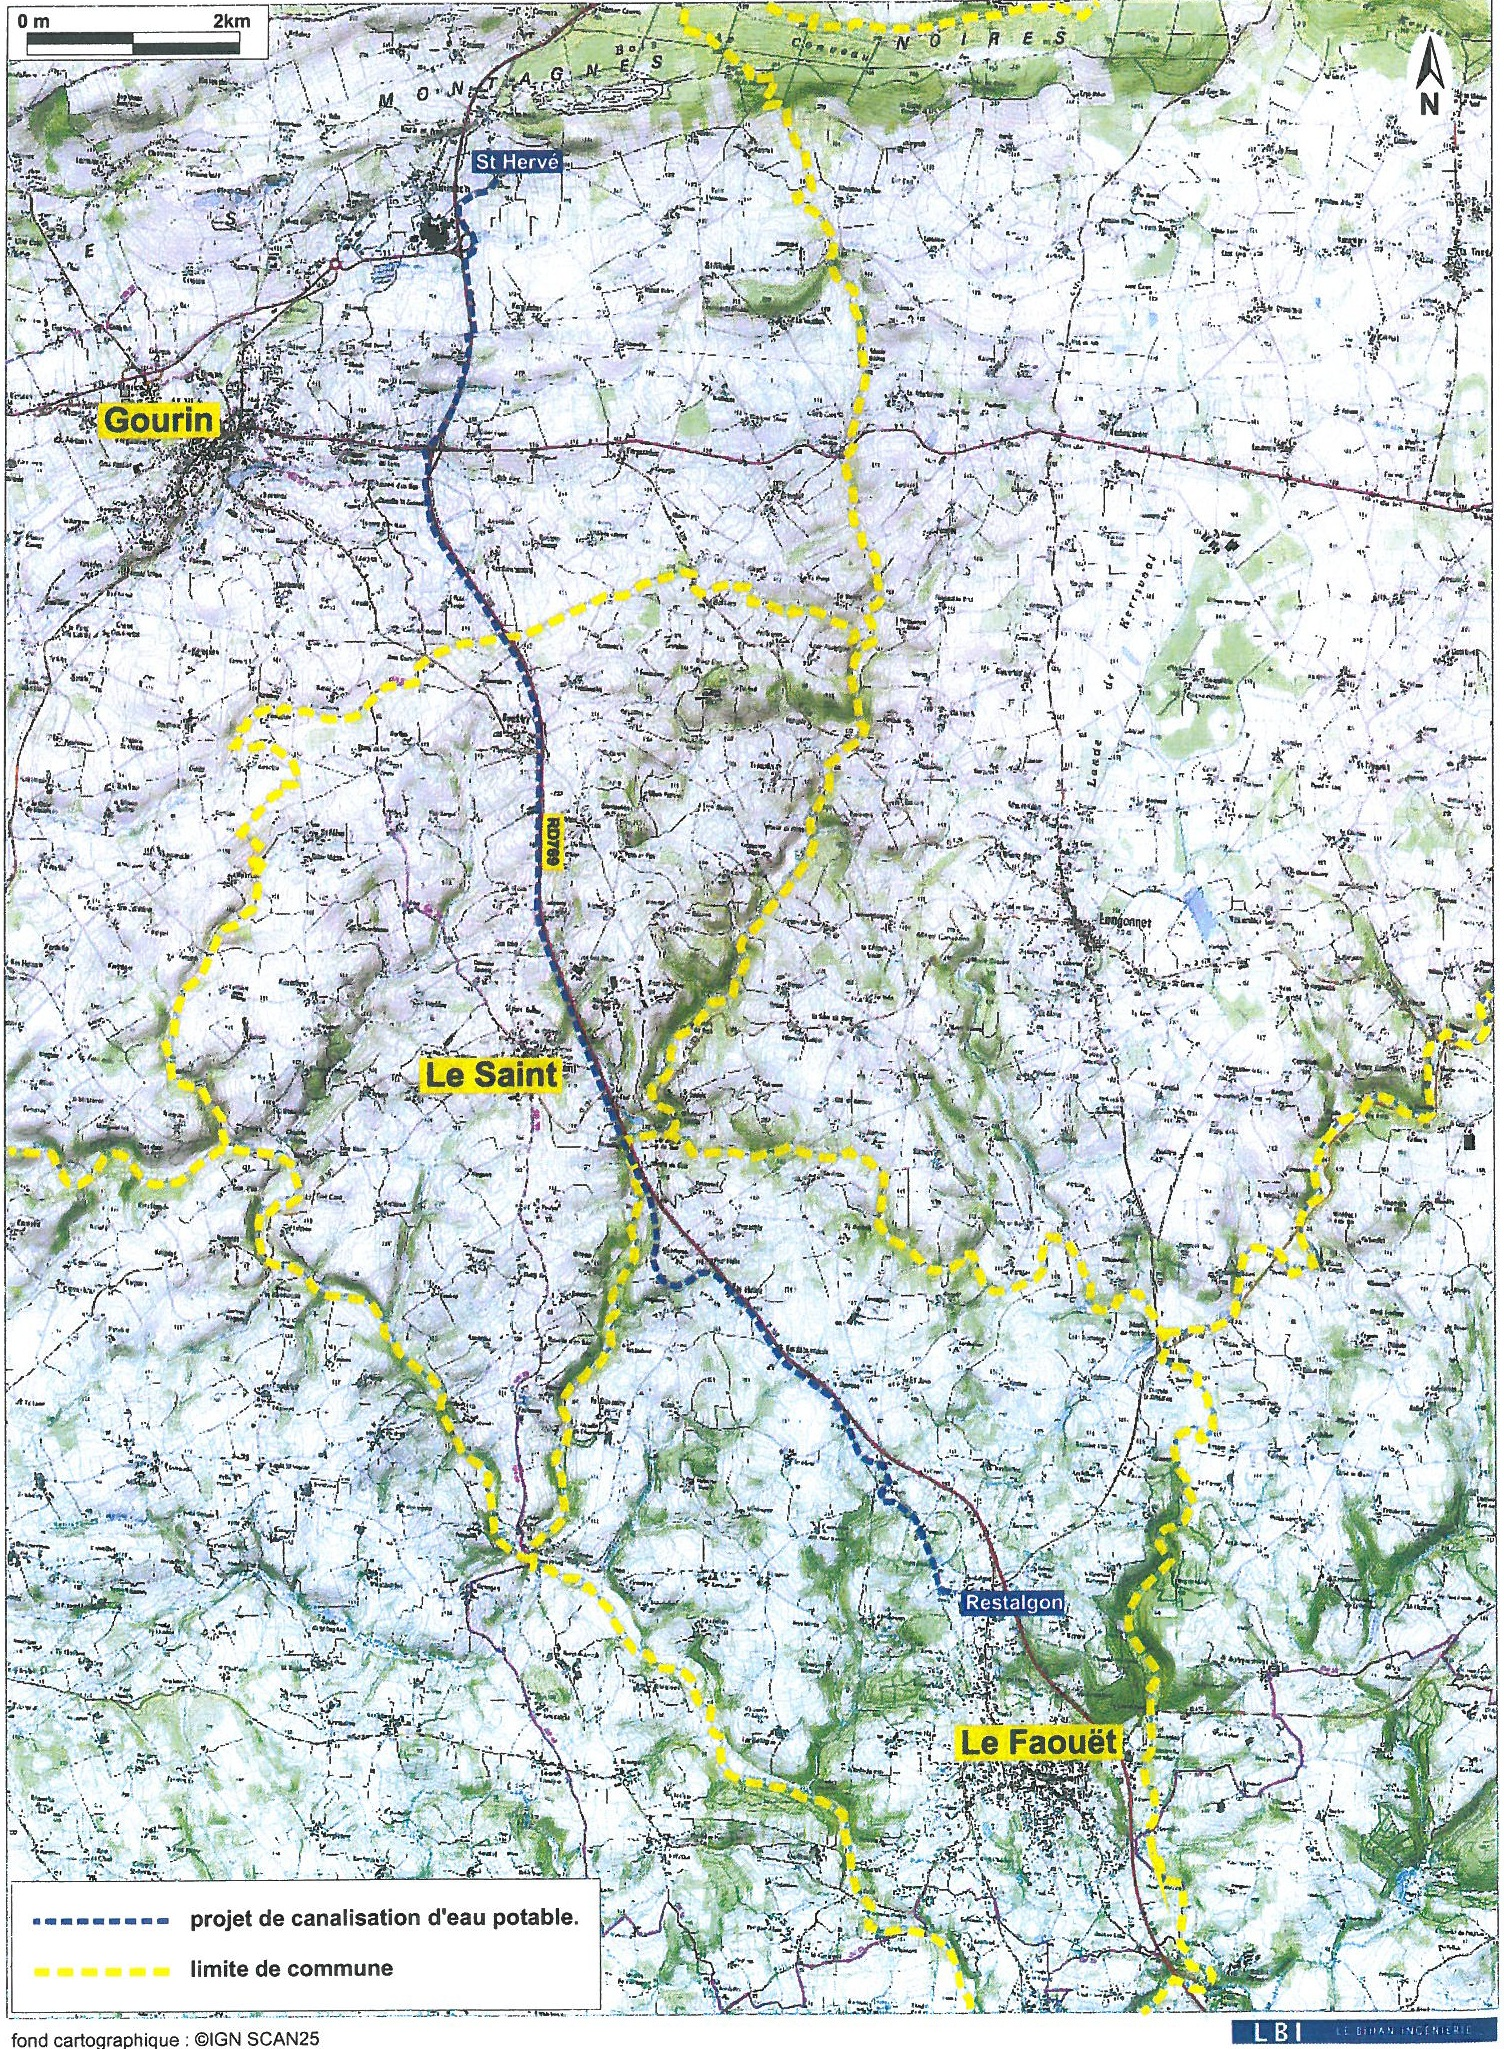 tracé Gourin Le Faouët